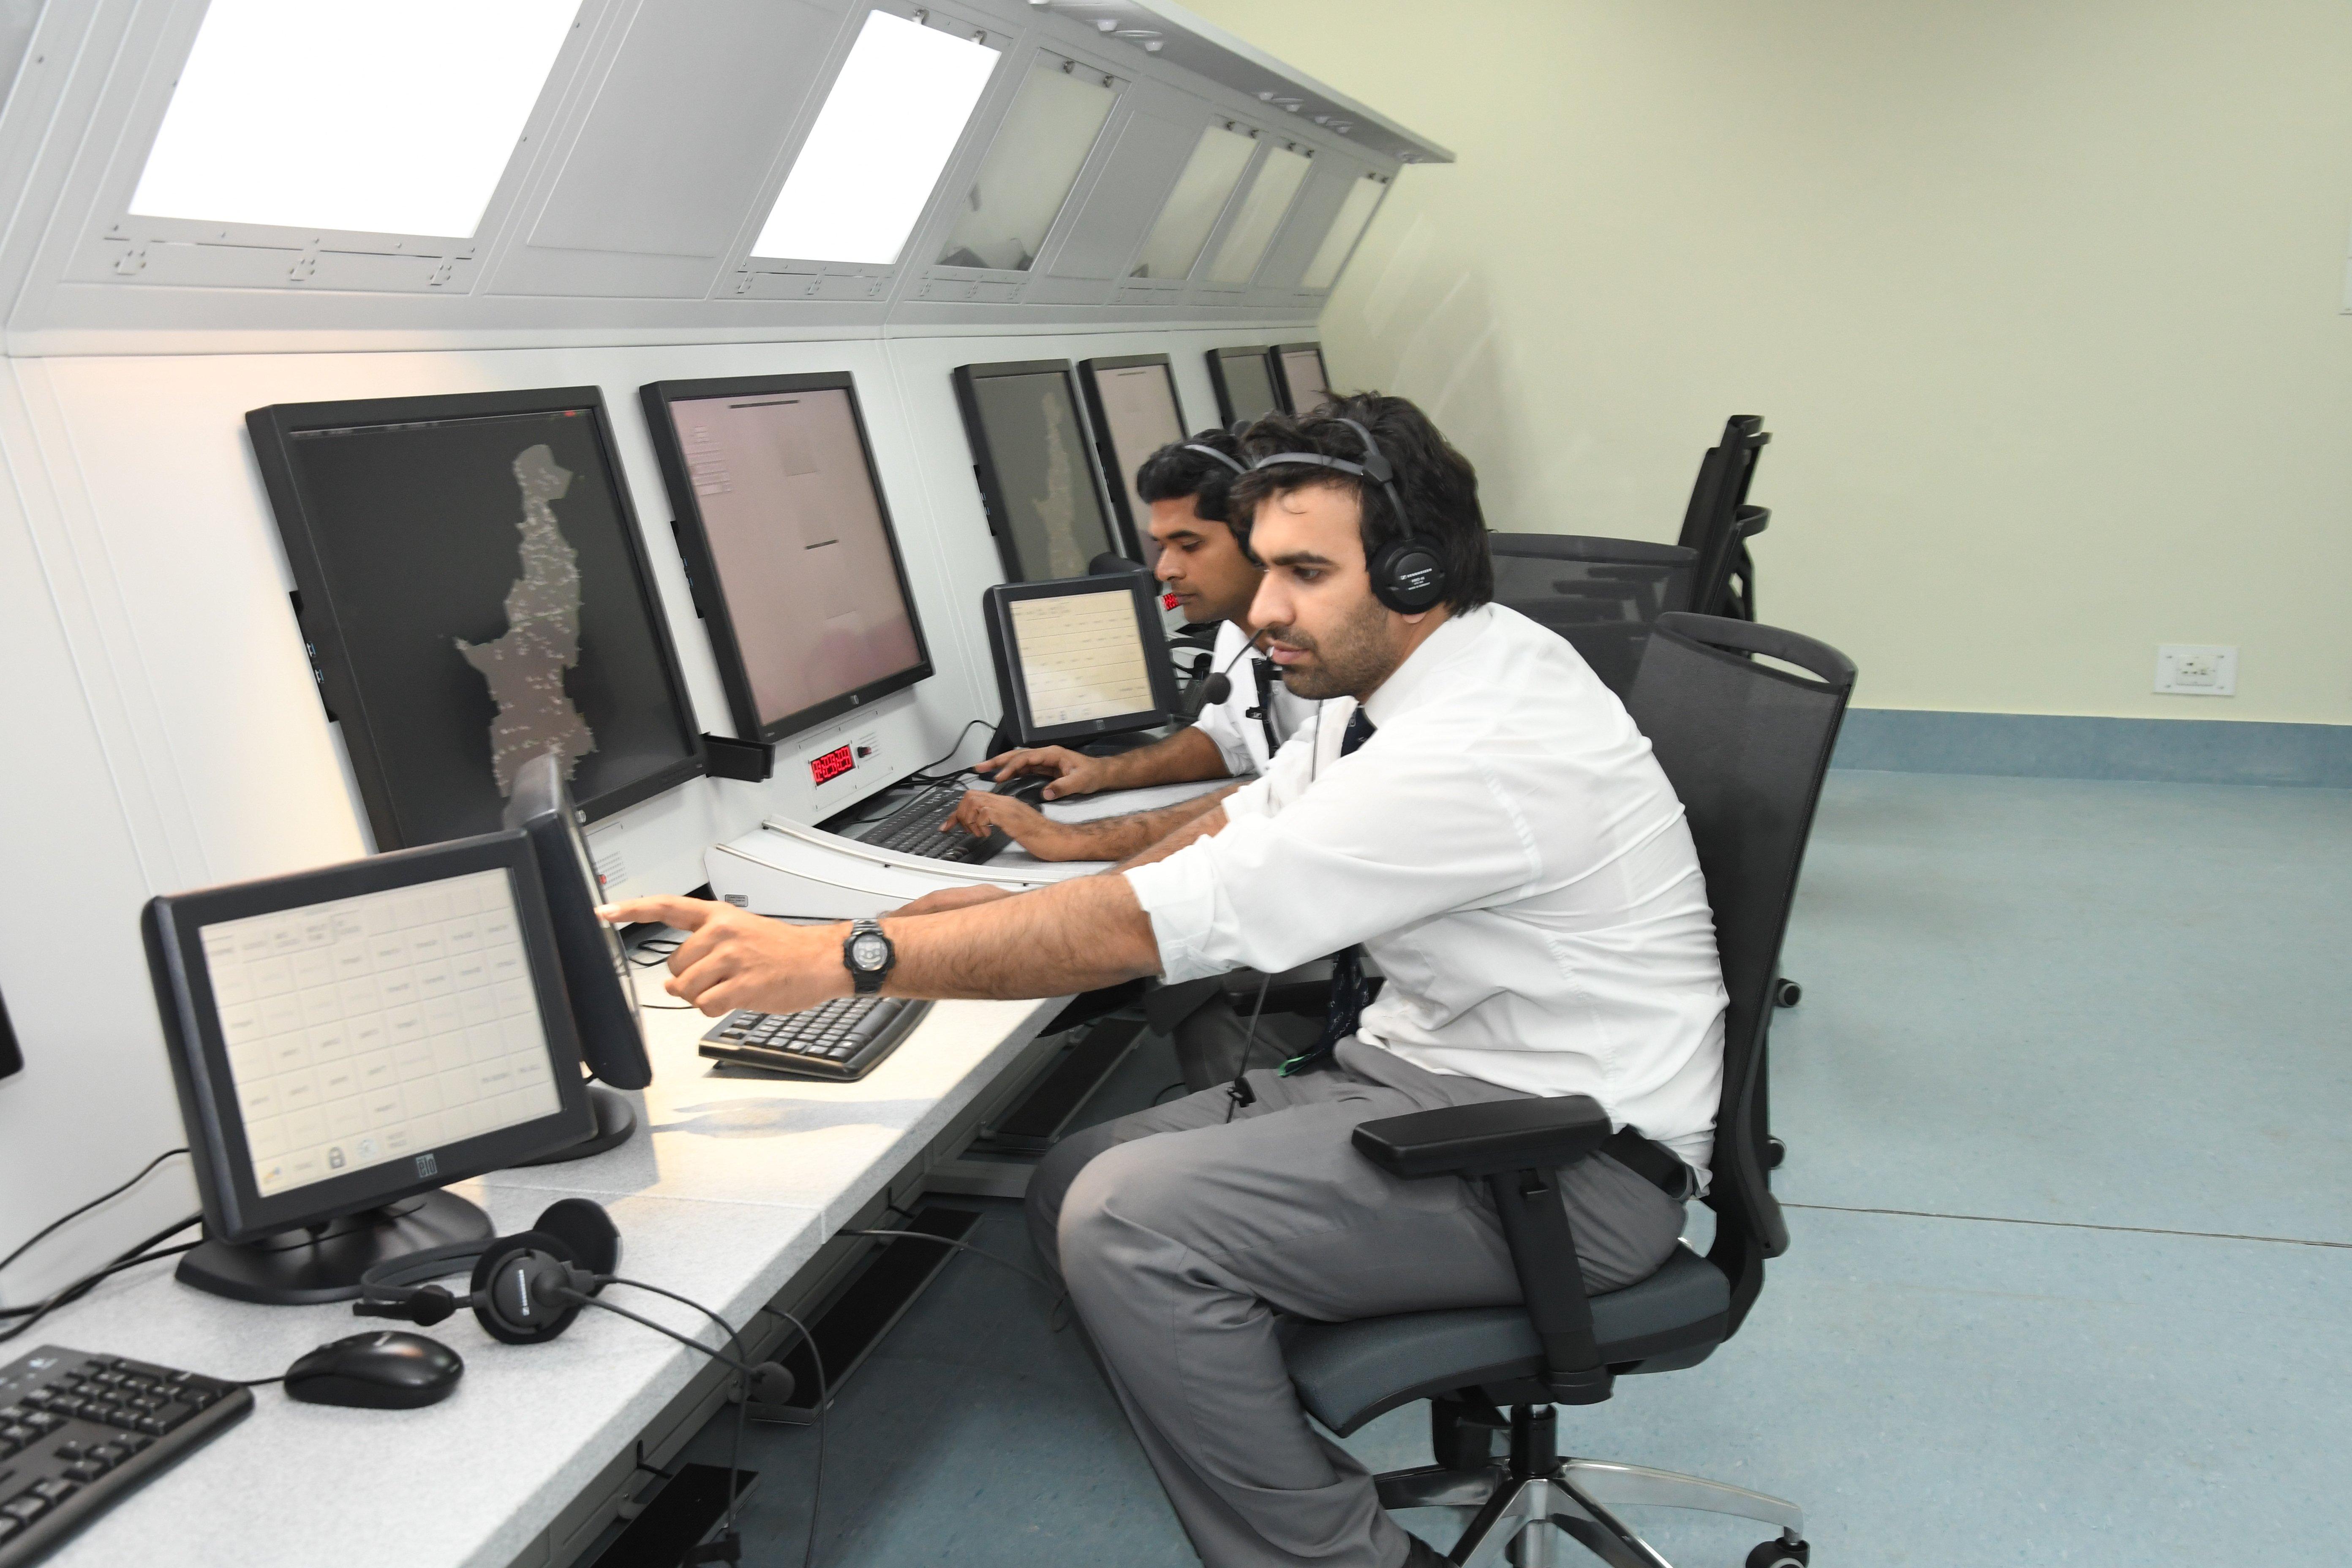 radar-high-consoles